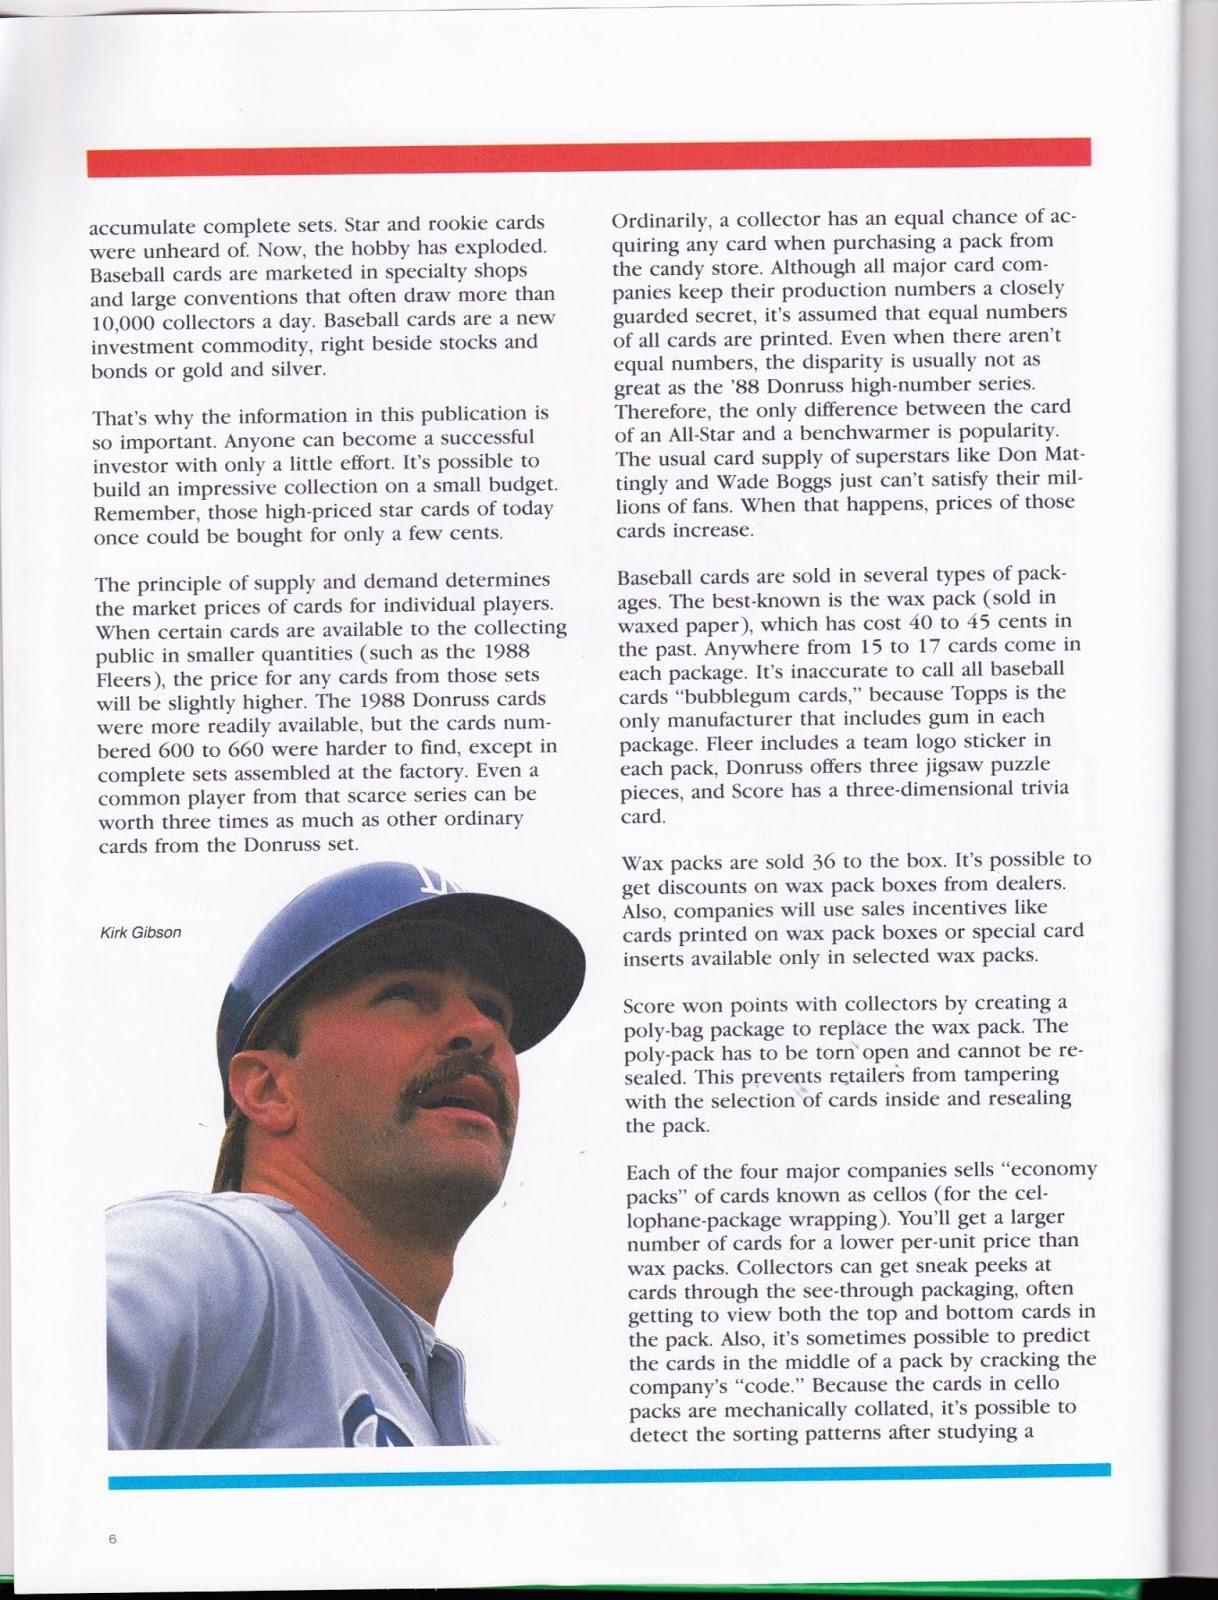 Rebel Random Ramblings Book On Baseball Cards From 30 Years Ago